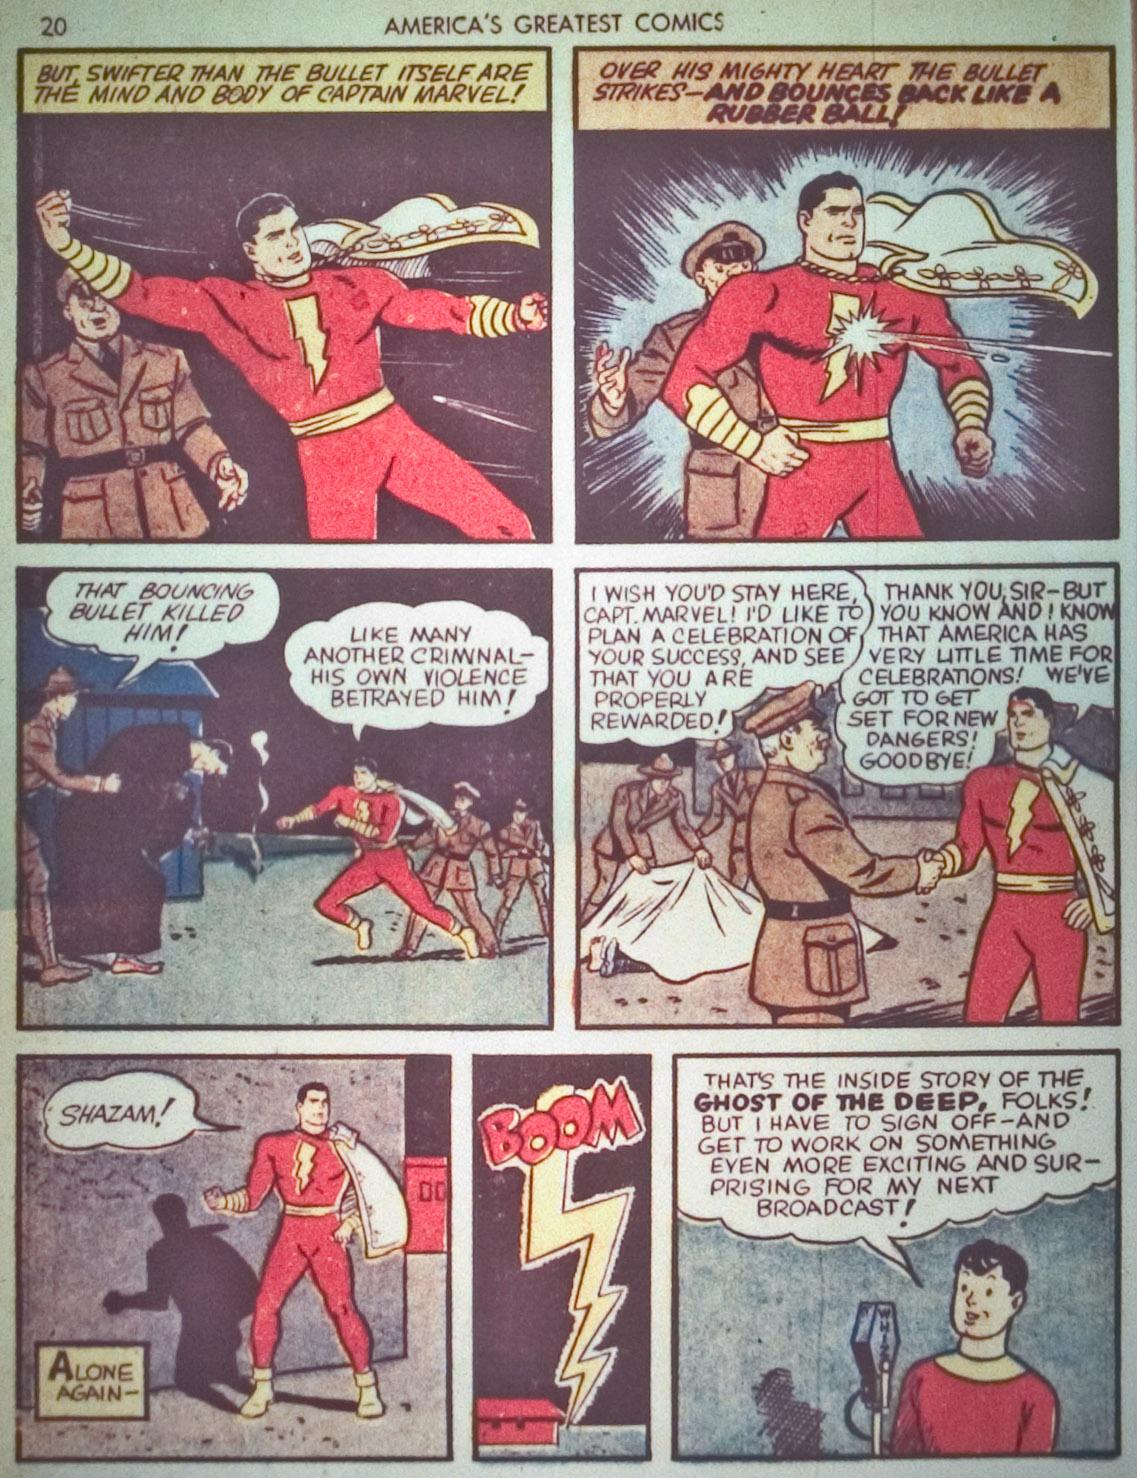 Read online America's Greatest Comics comic -  Issue #1 - 23